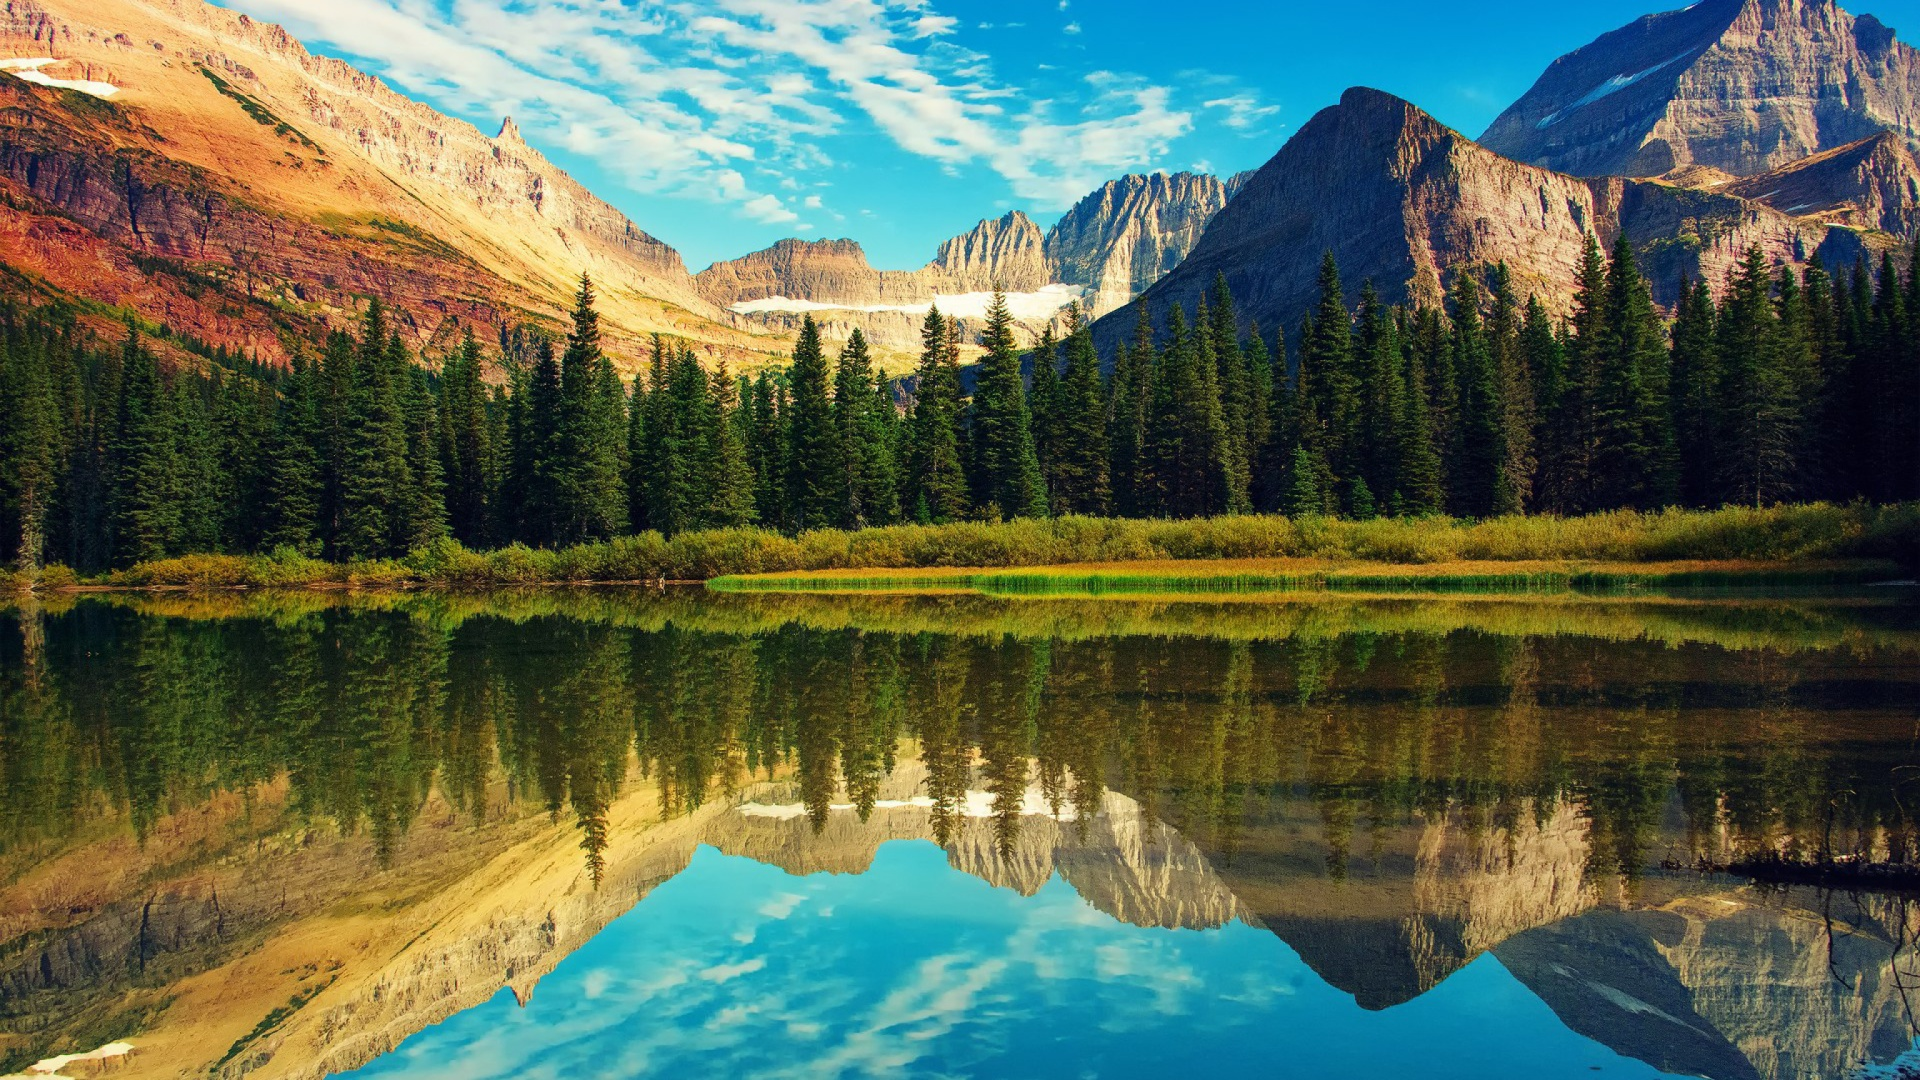 glacier national park in usa wallpaper for desktop